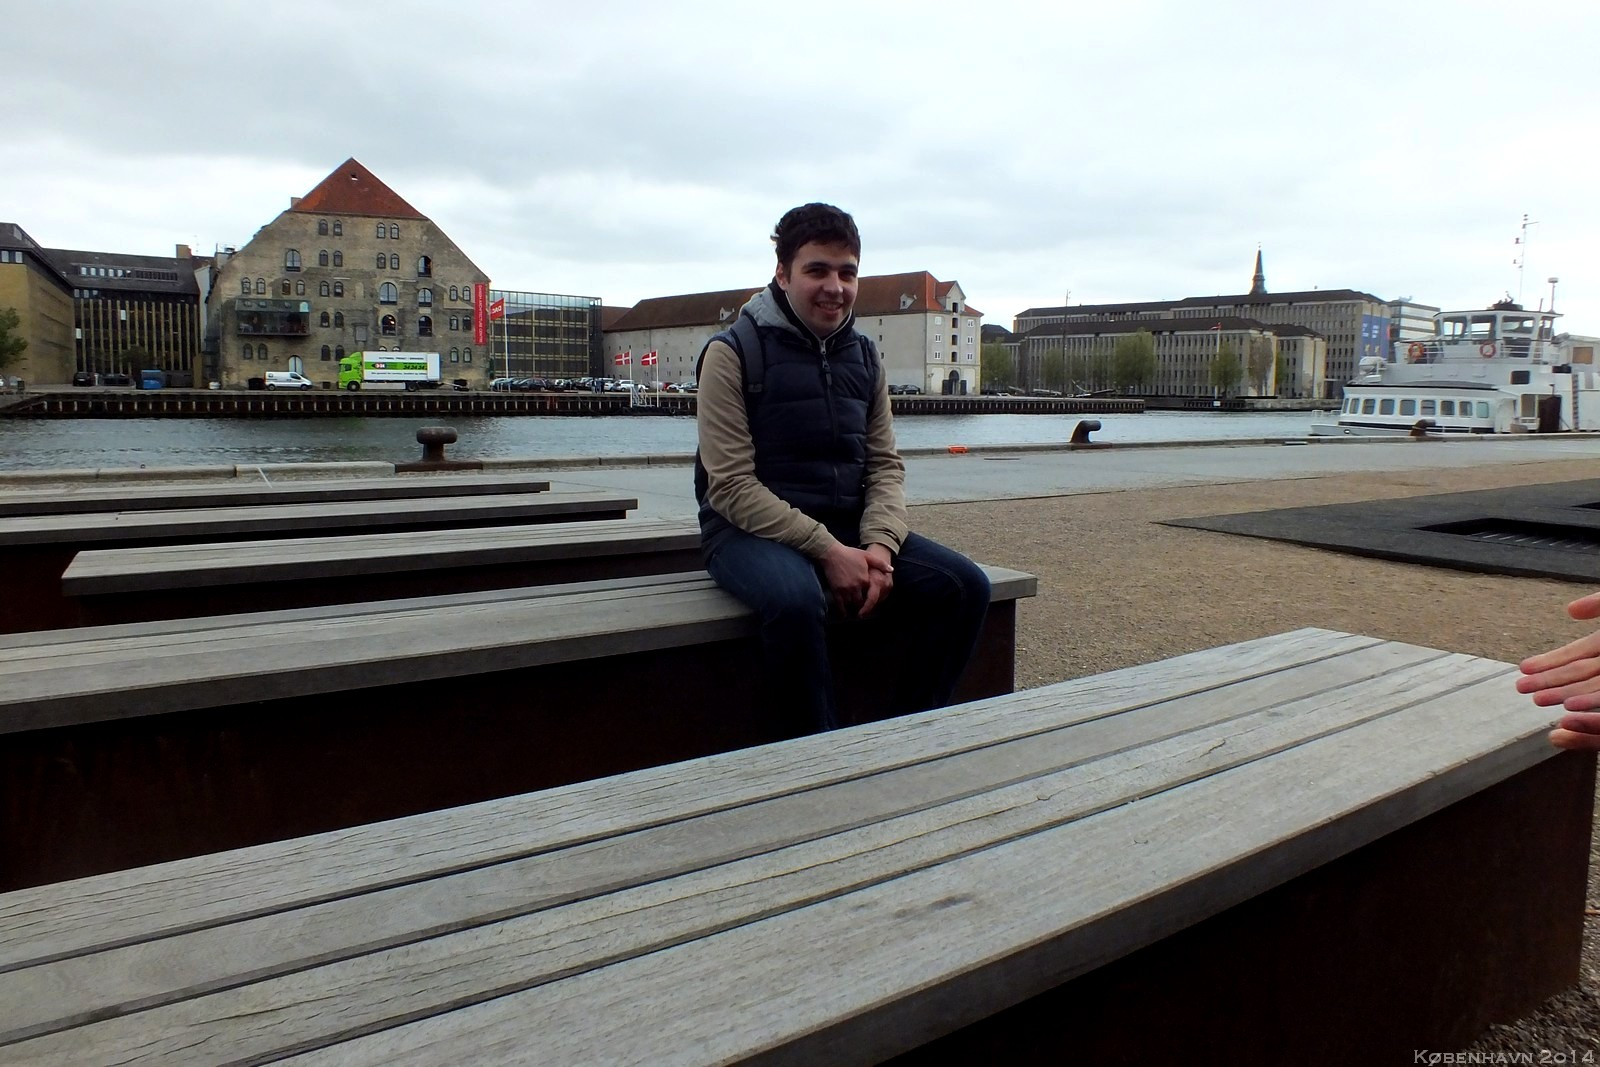 Havnepromenade, København, Denmark